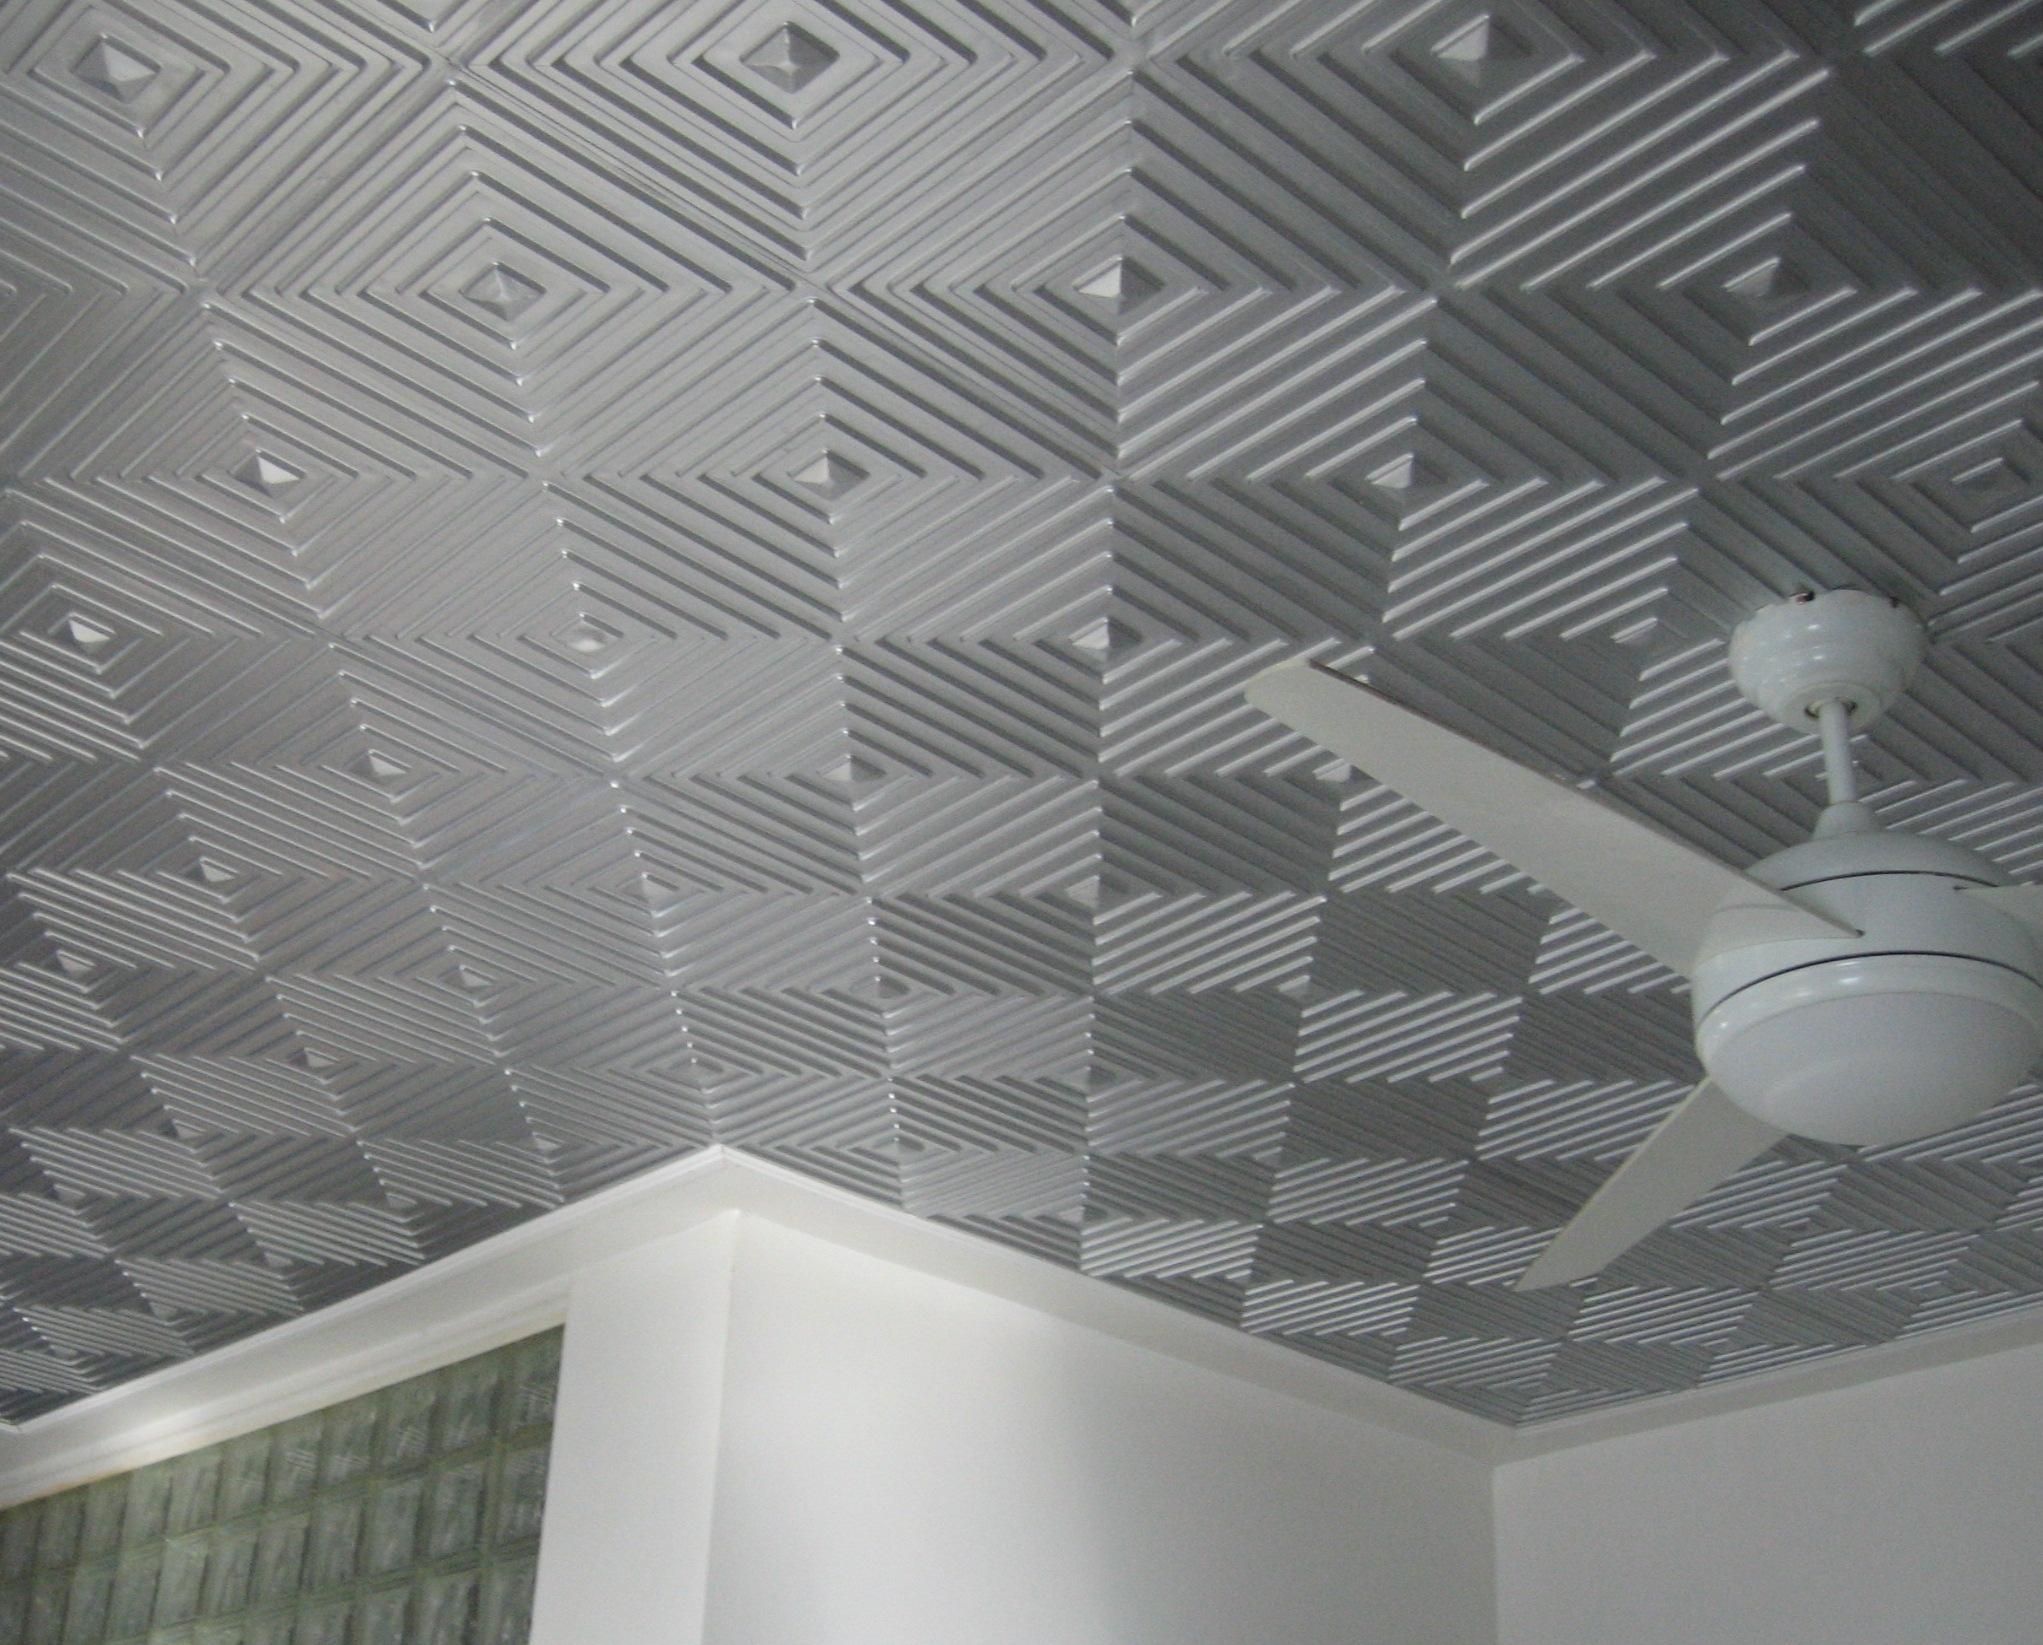 Foam Tiles On Ceiling